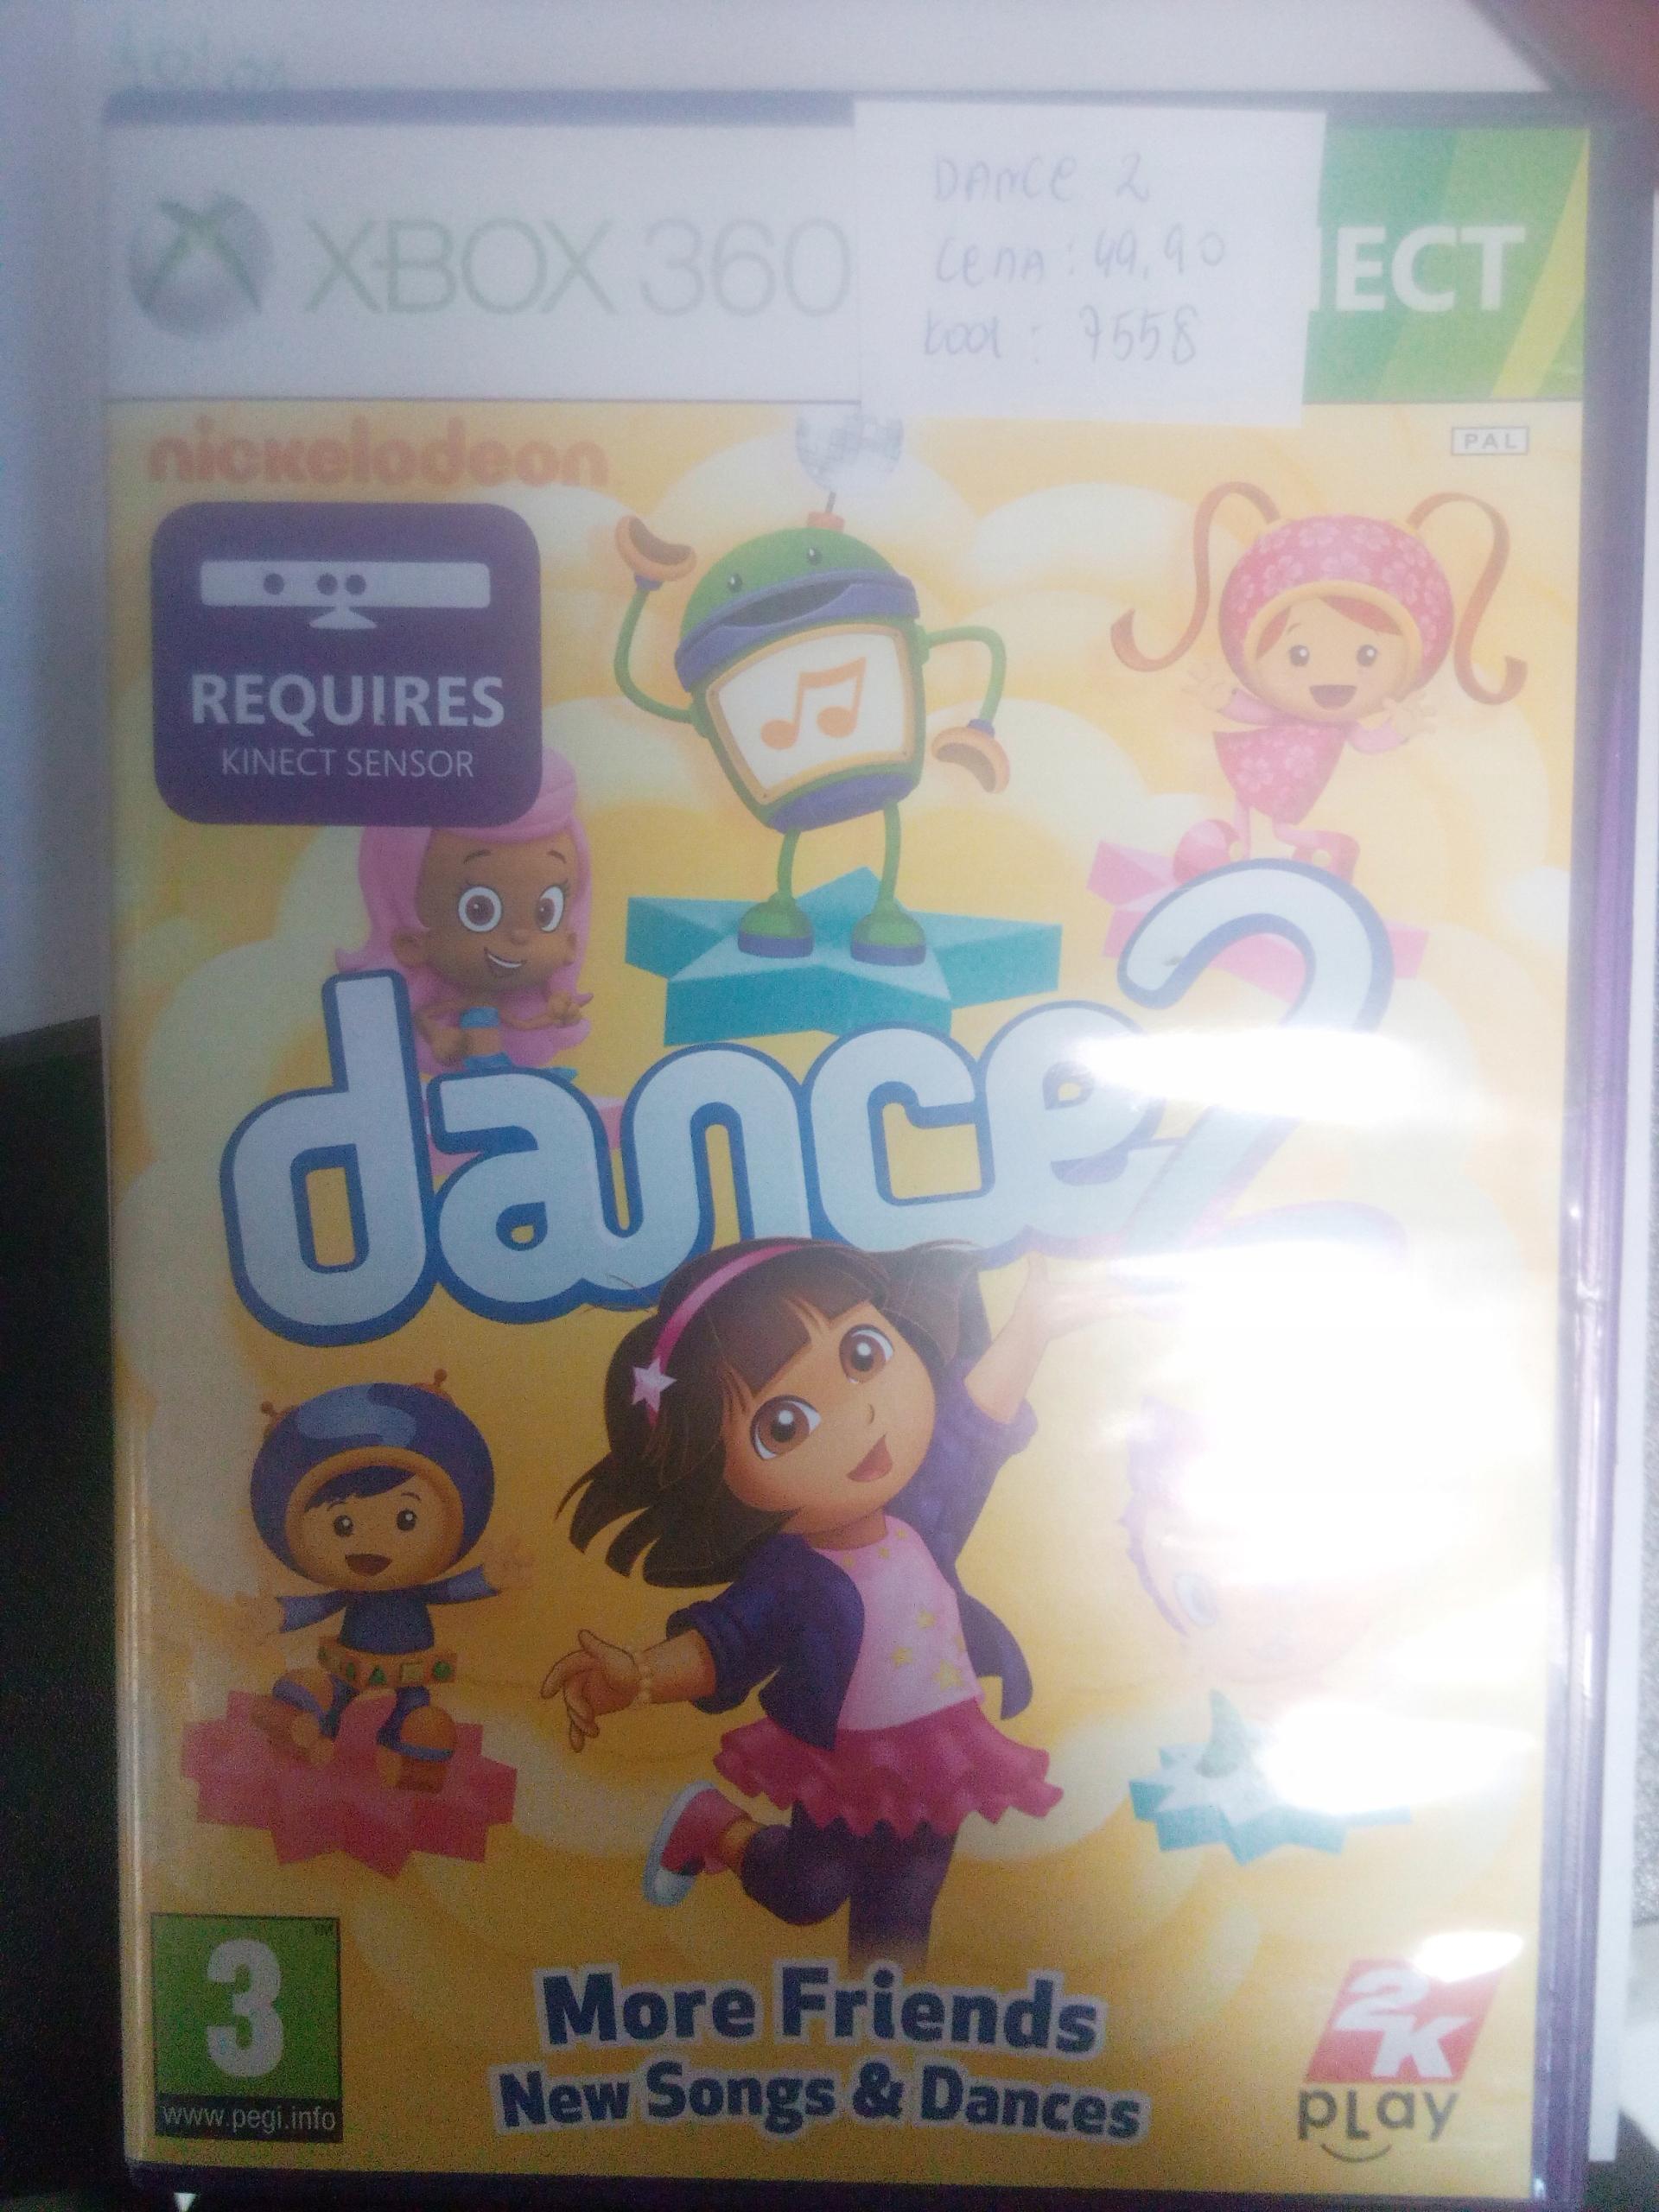 NICKELODEON DANCE 2 XBOX 360 SKLEP VIDEOTEKA TYCHY